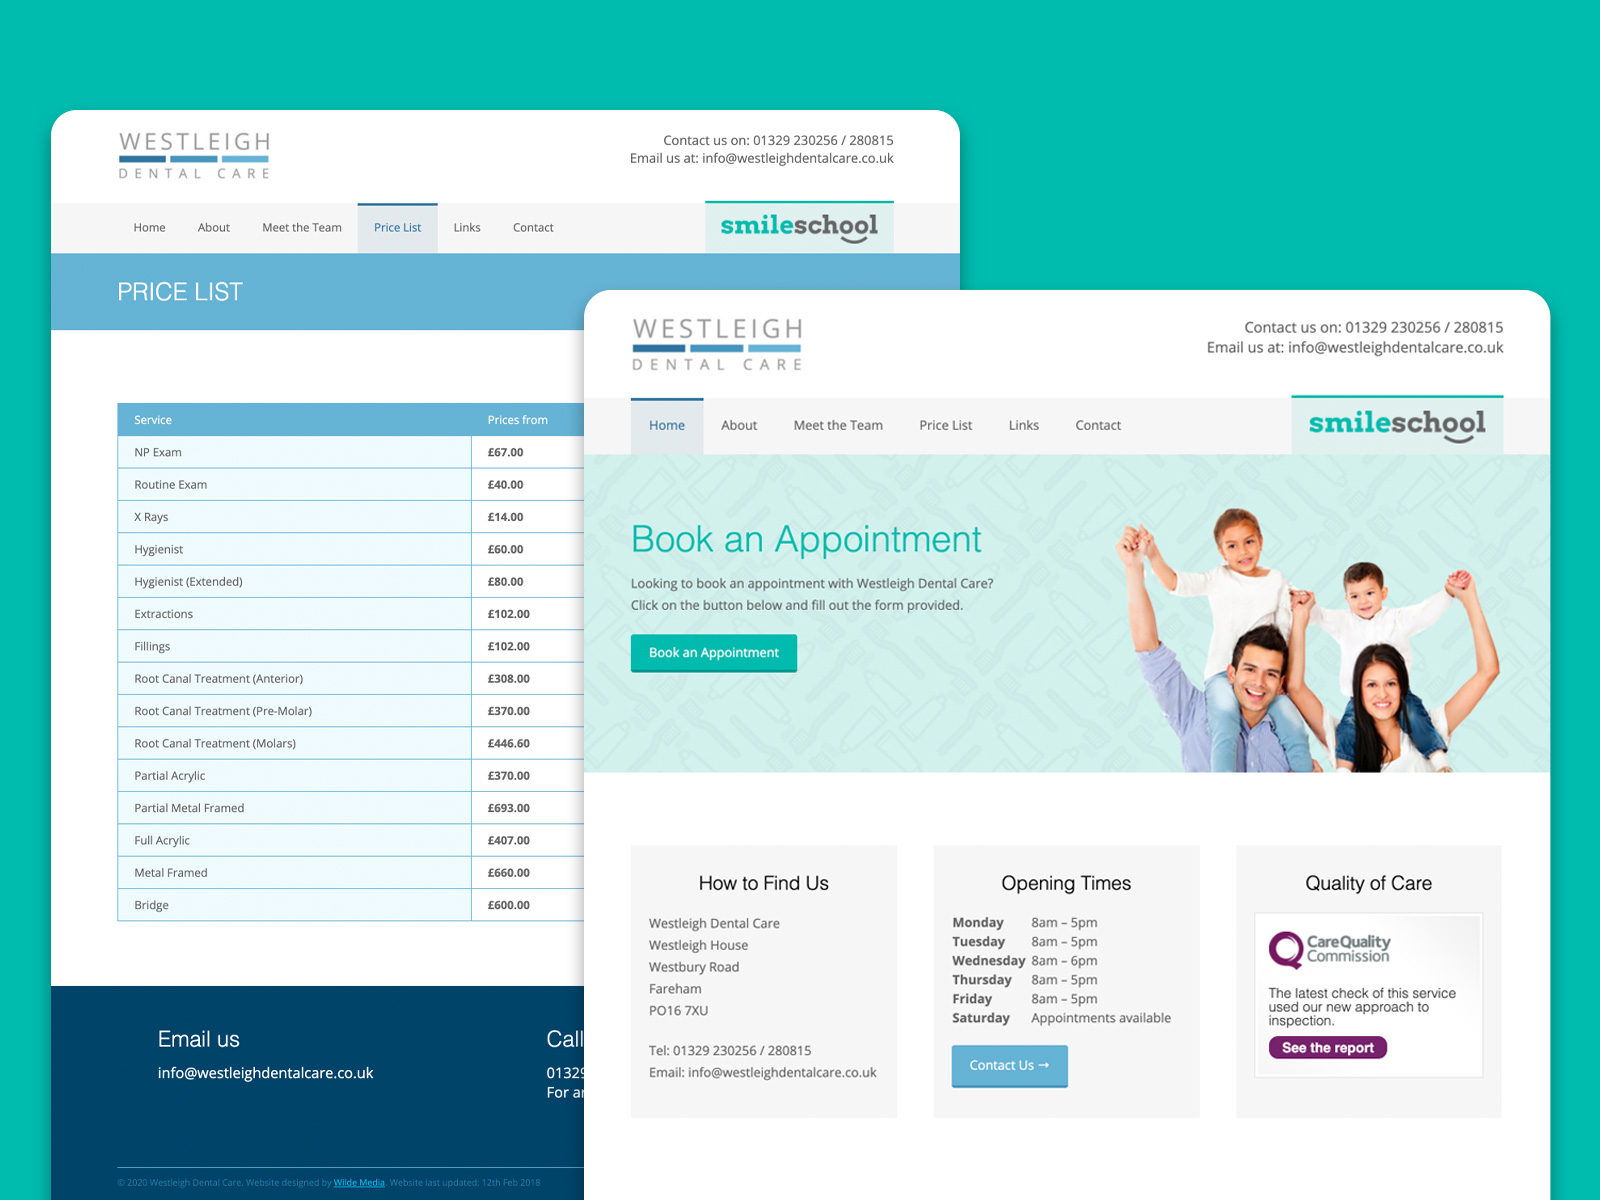 Westleigh Dental Care marketing website designed by freelance website designer Christine Wilde